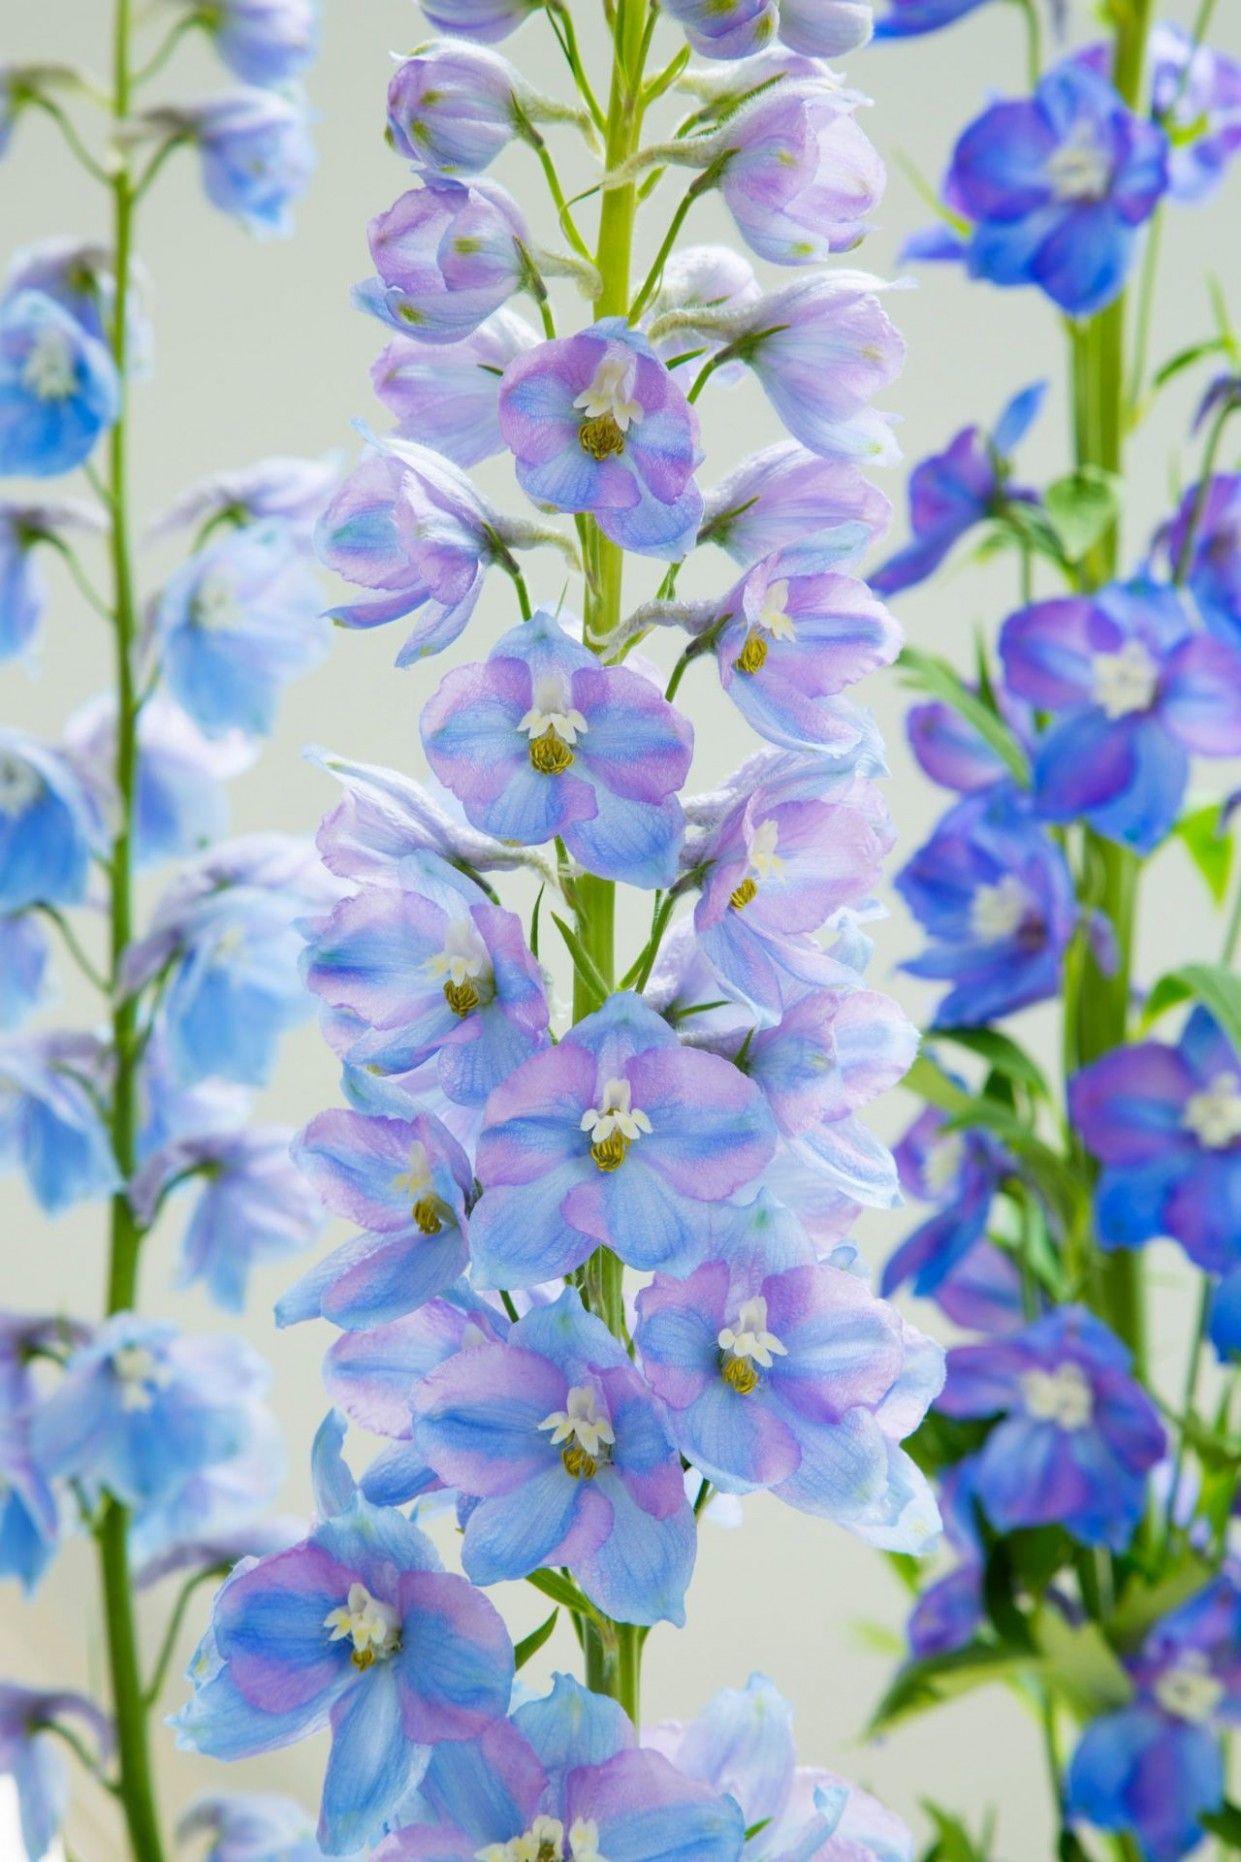 Learn The Truth About Annual Delphinium Flower Uk In The Next 16 Seconds In 2020 Delphinium Flowers Flower Garden Plans Delphinium